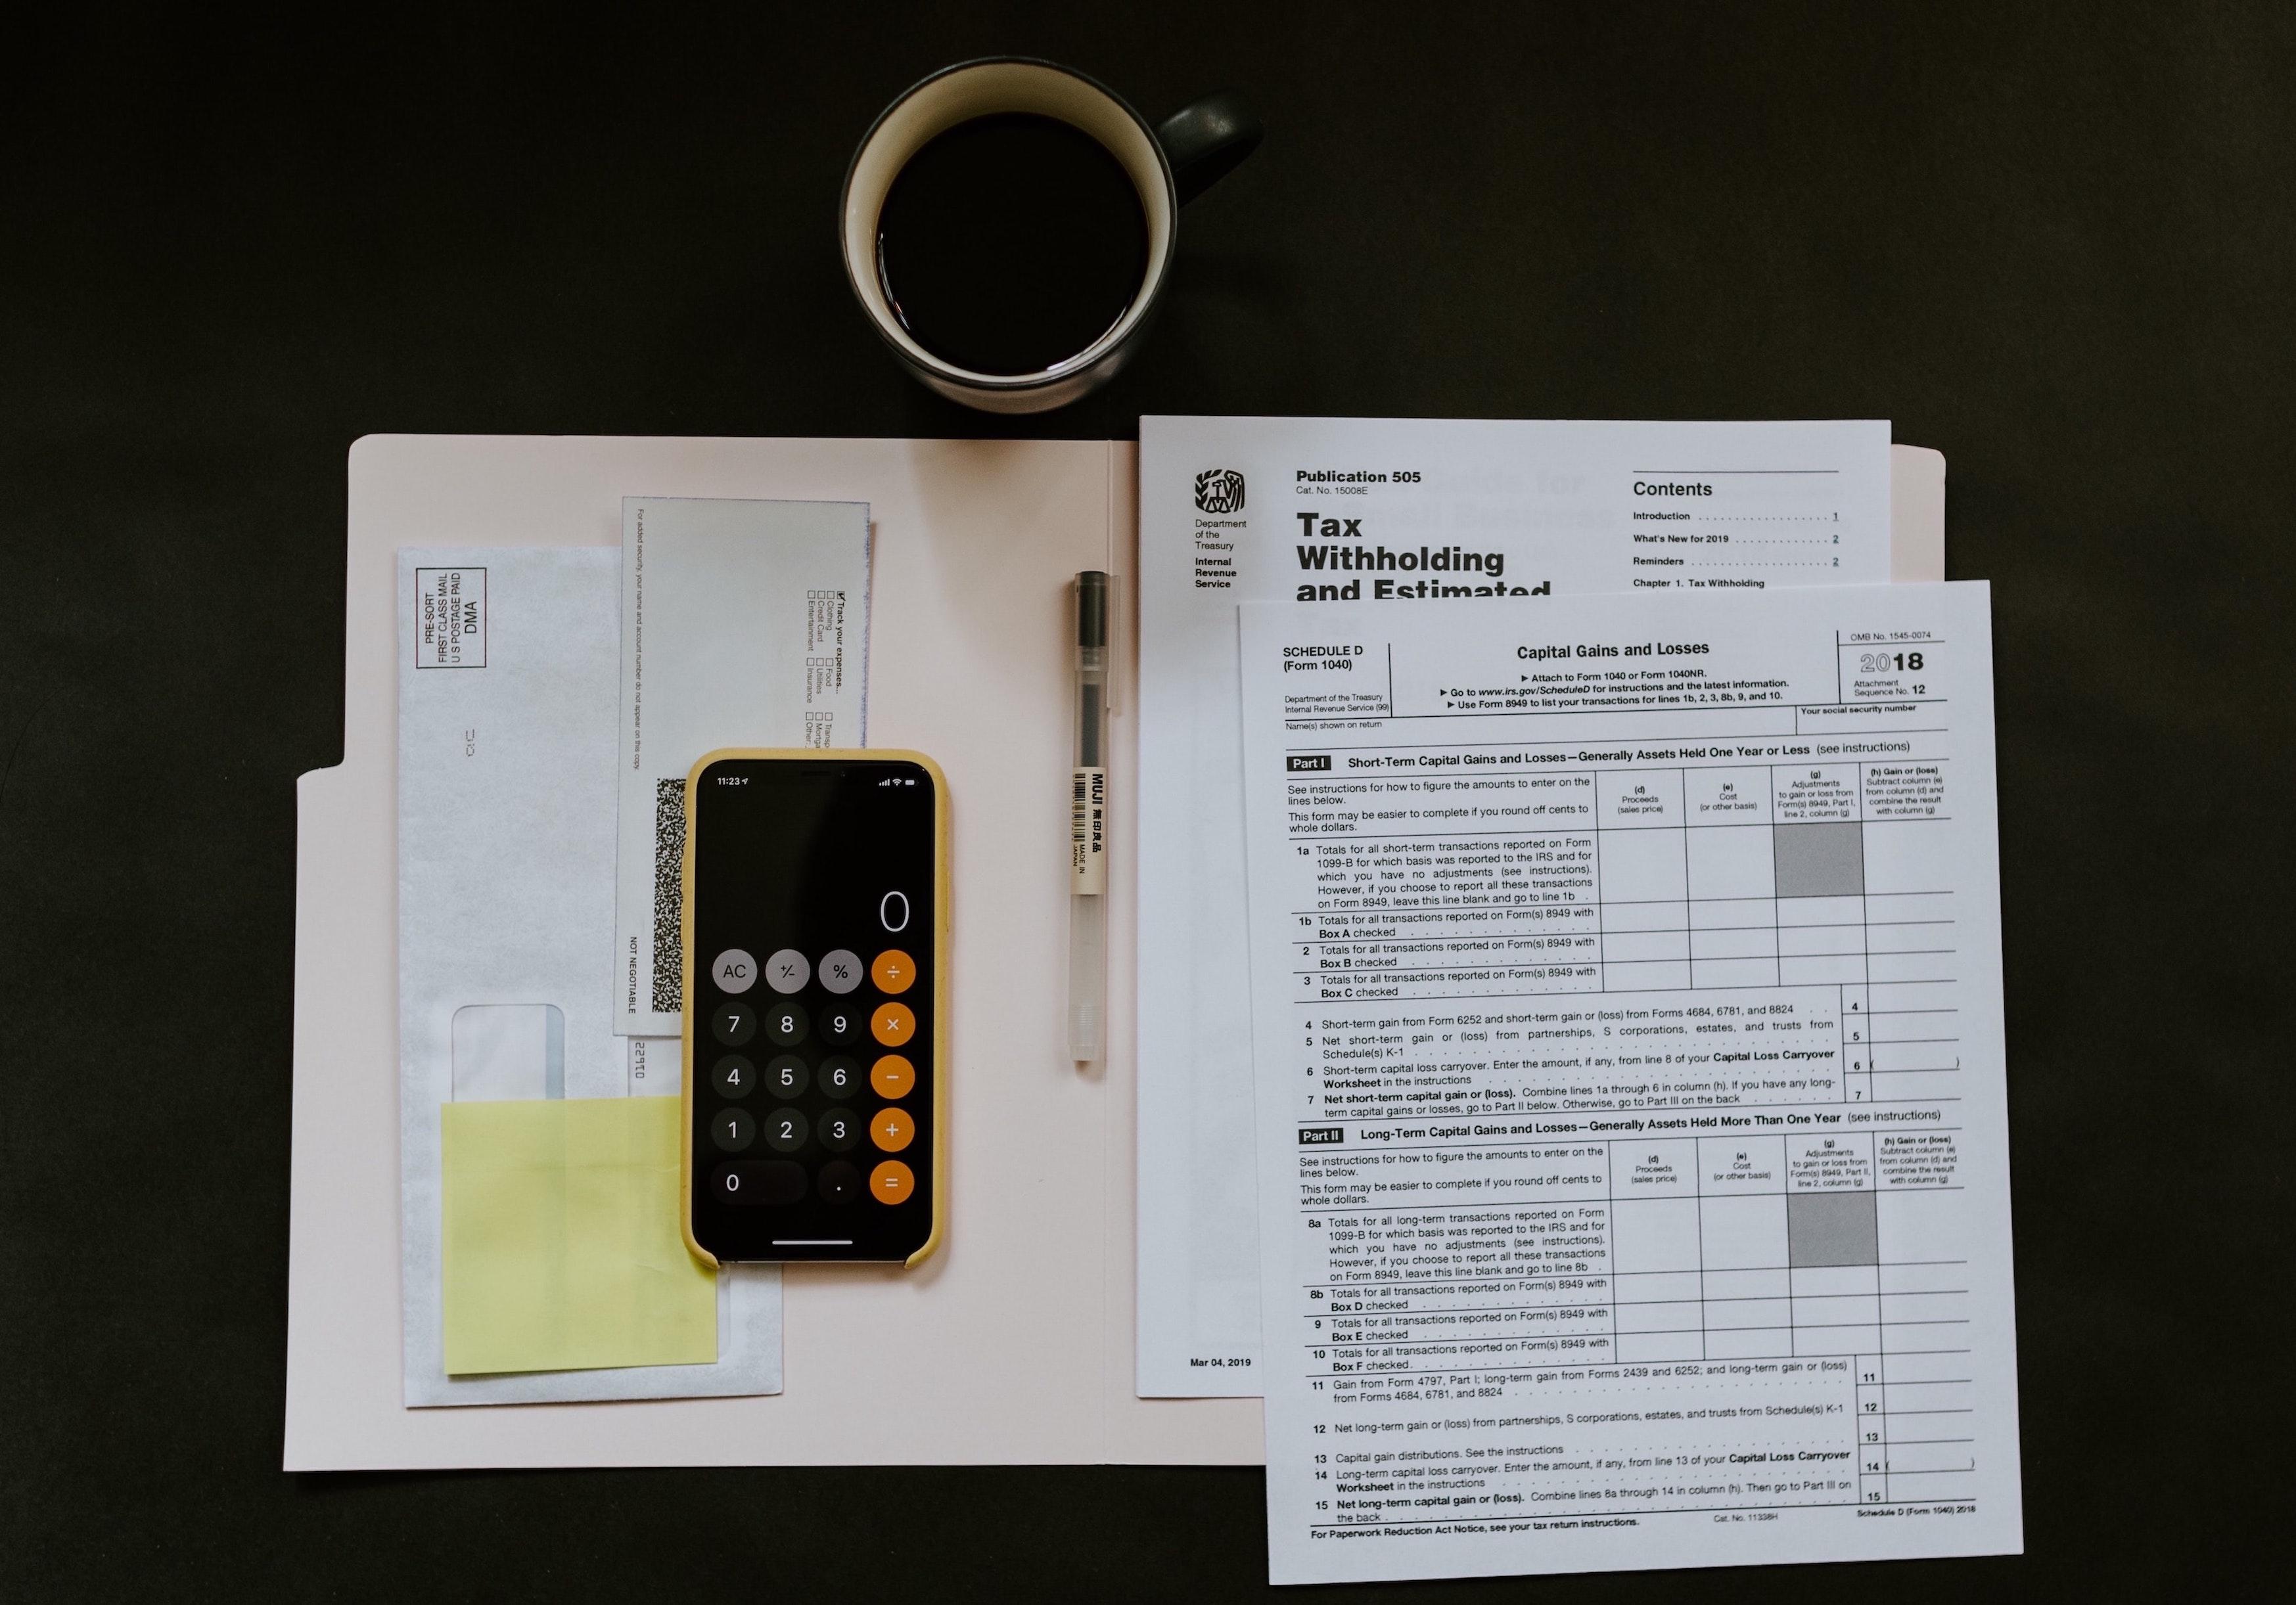 Protecting Employee Data During Tax Season